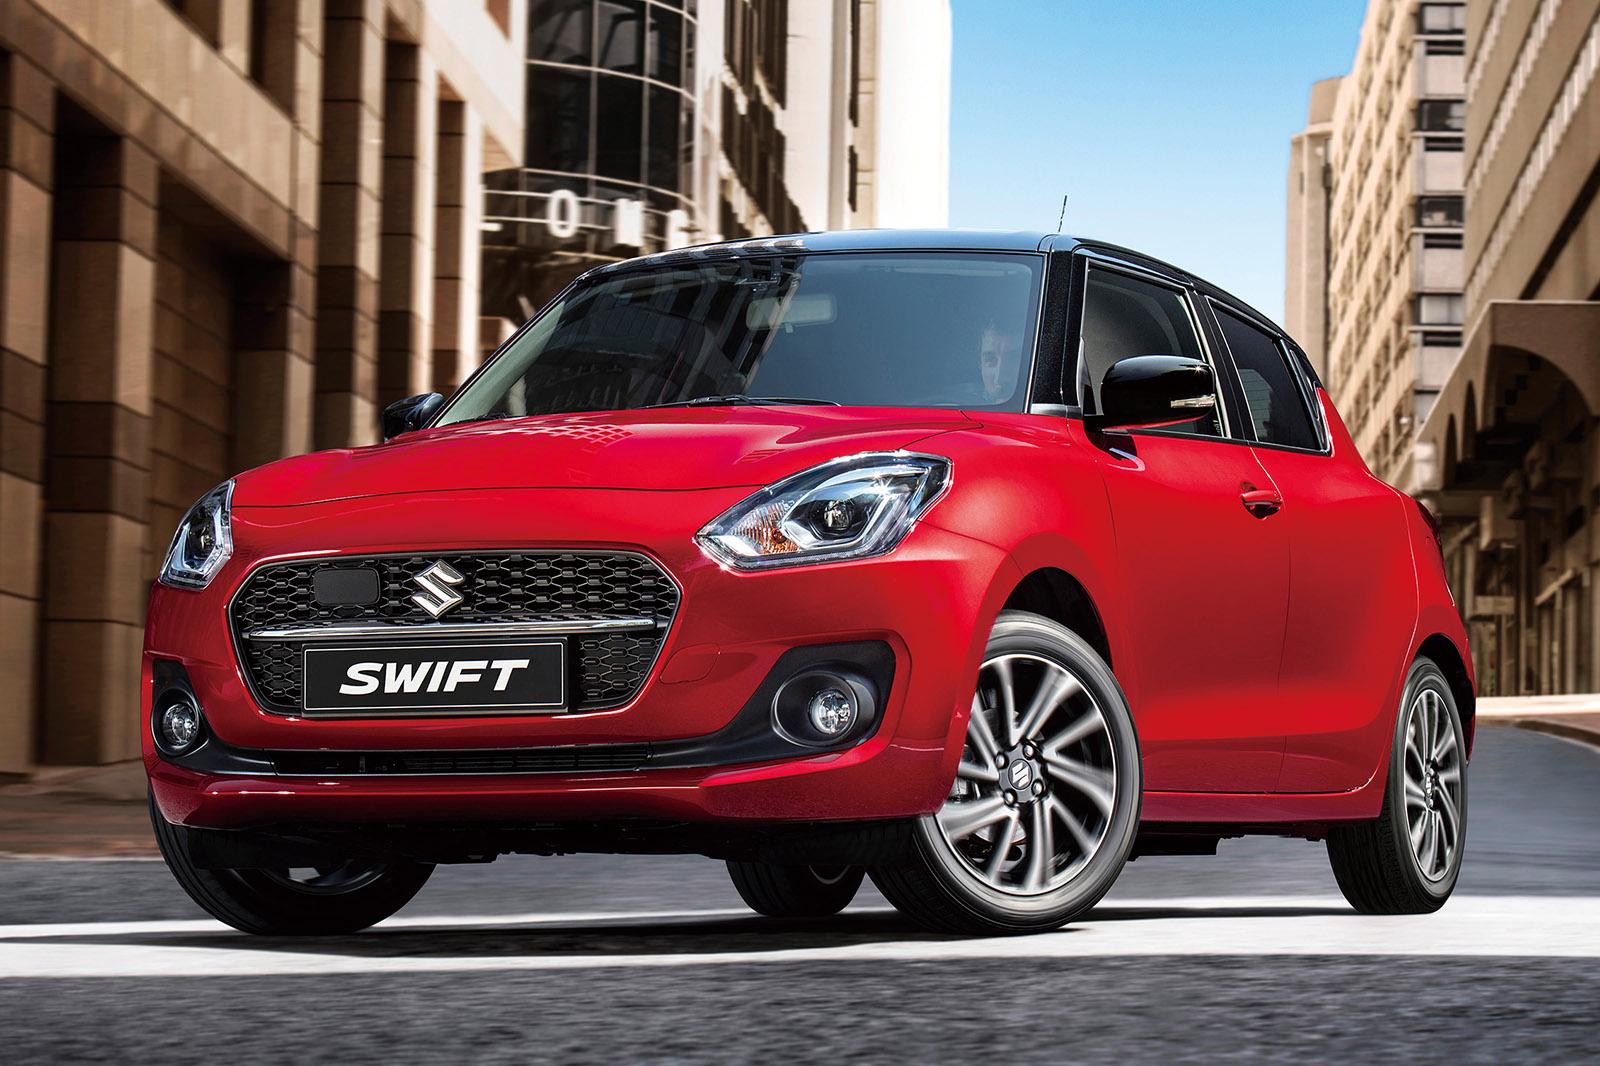 2021 Suzuki Swift gets new engine, styling and tech ...